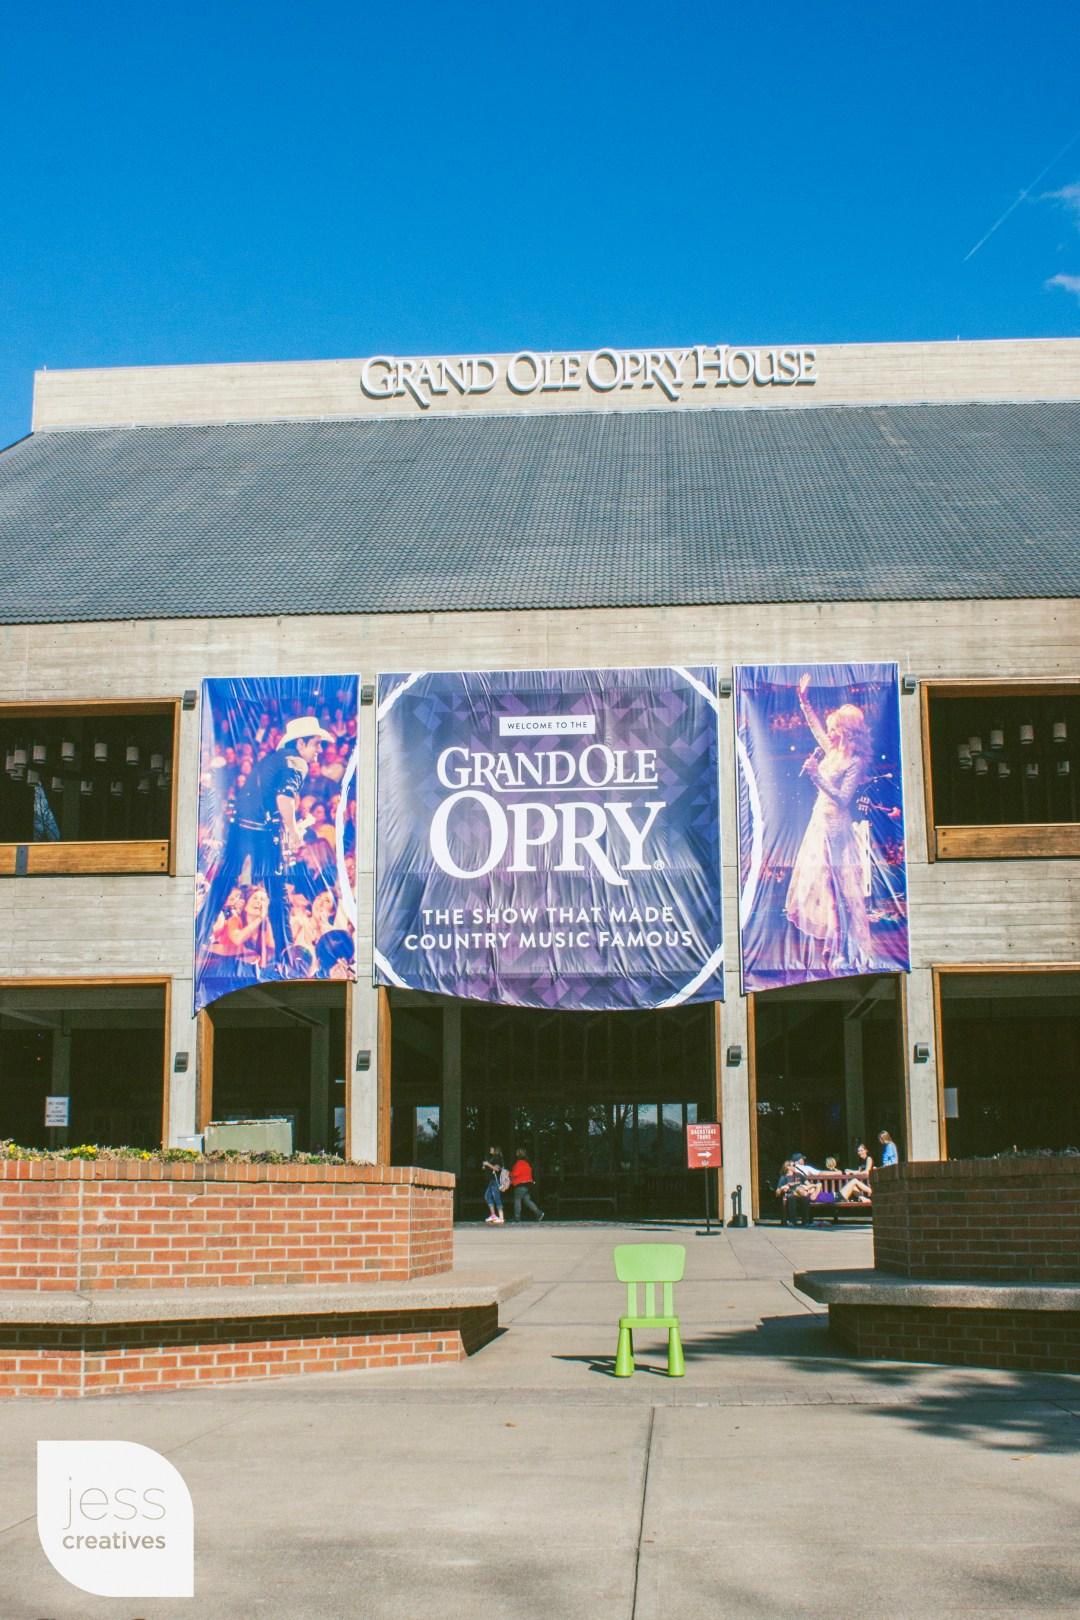 Opry stage, here I come! La la la laaaaaaaa!